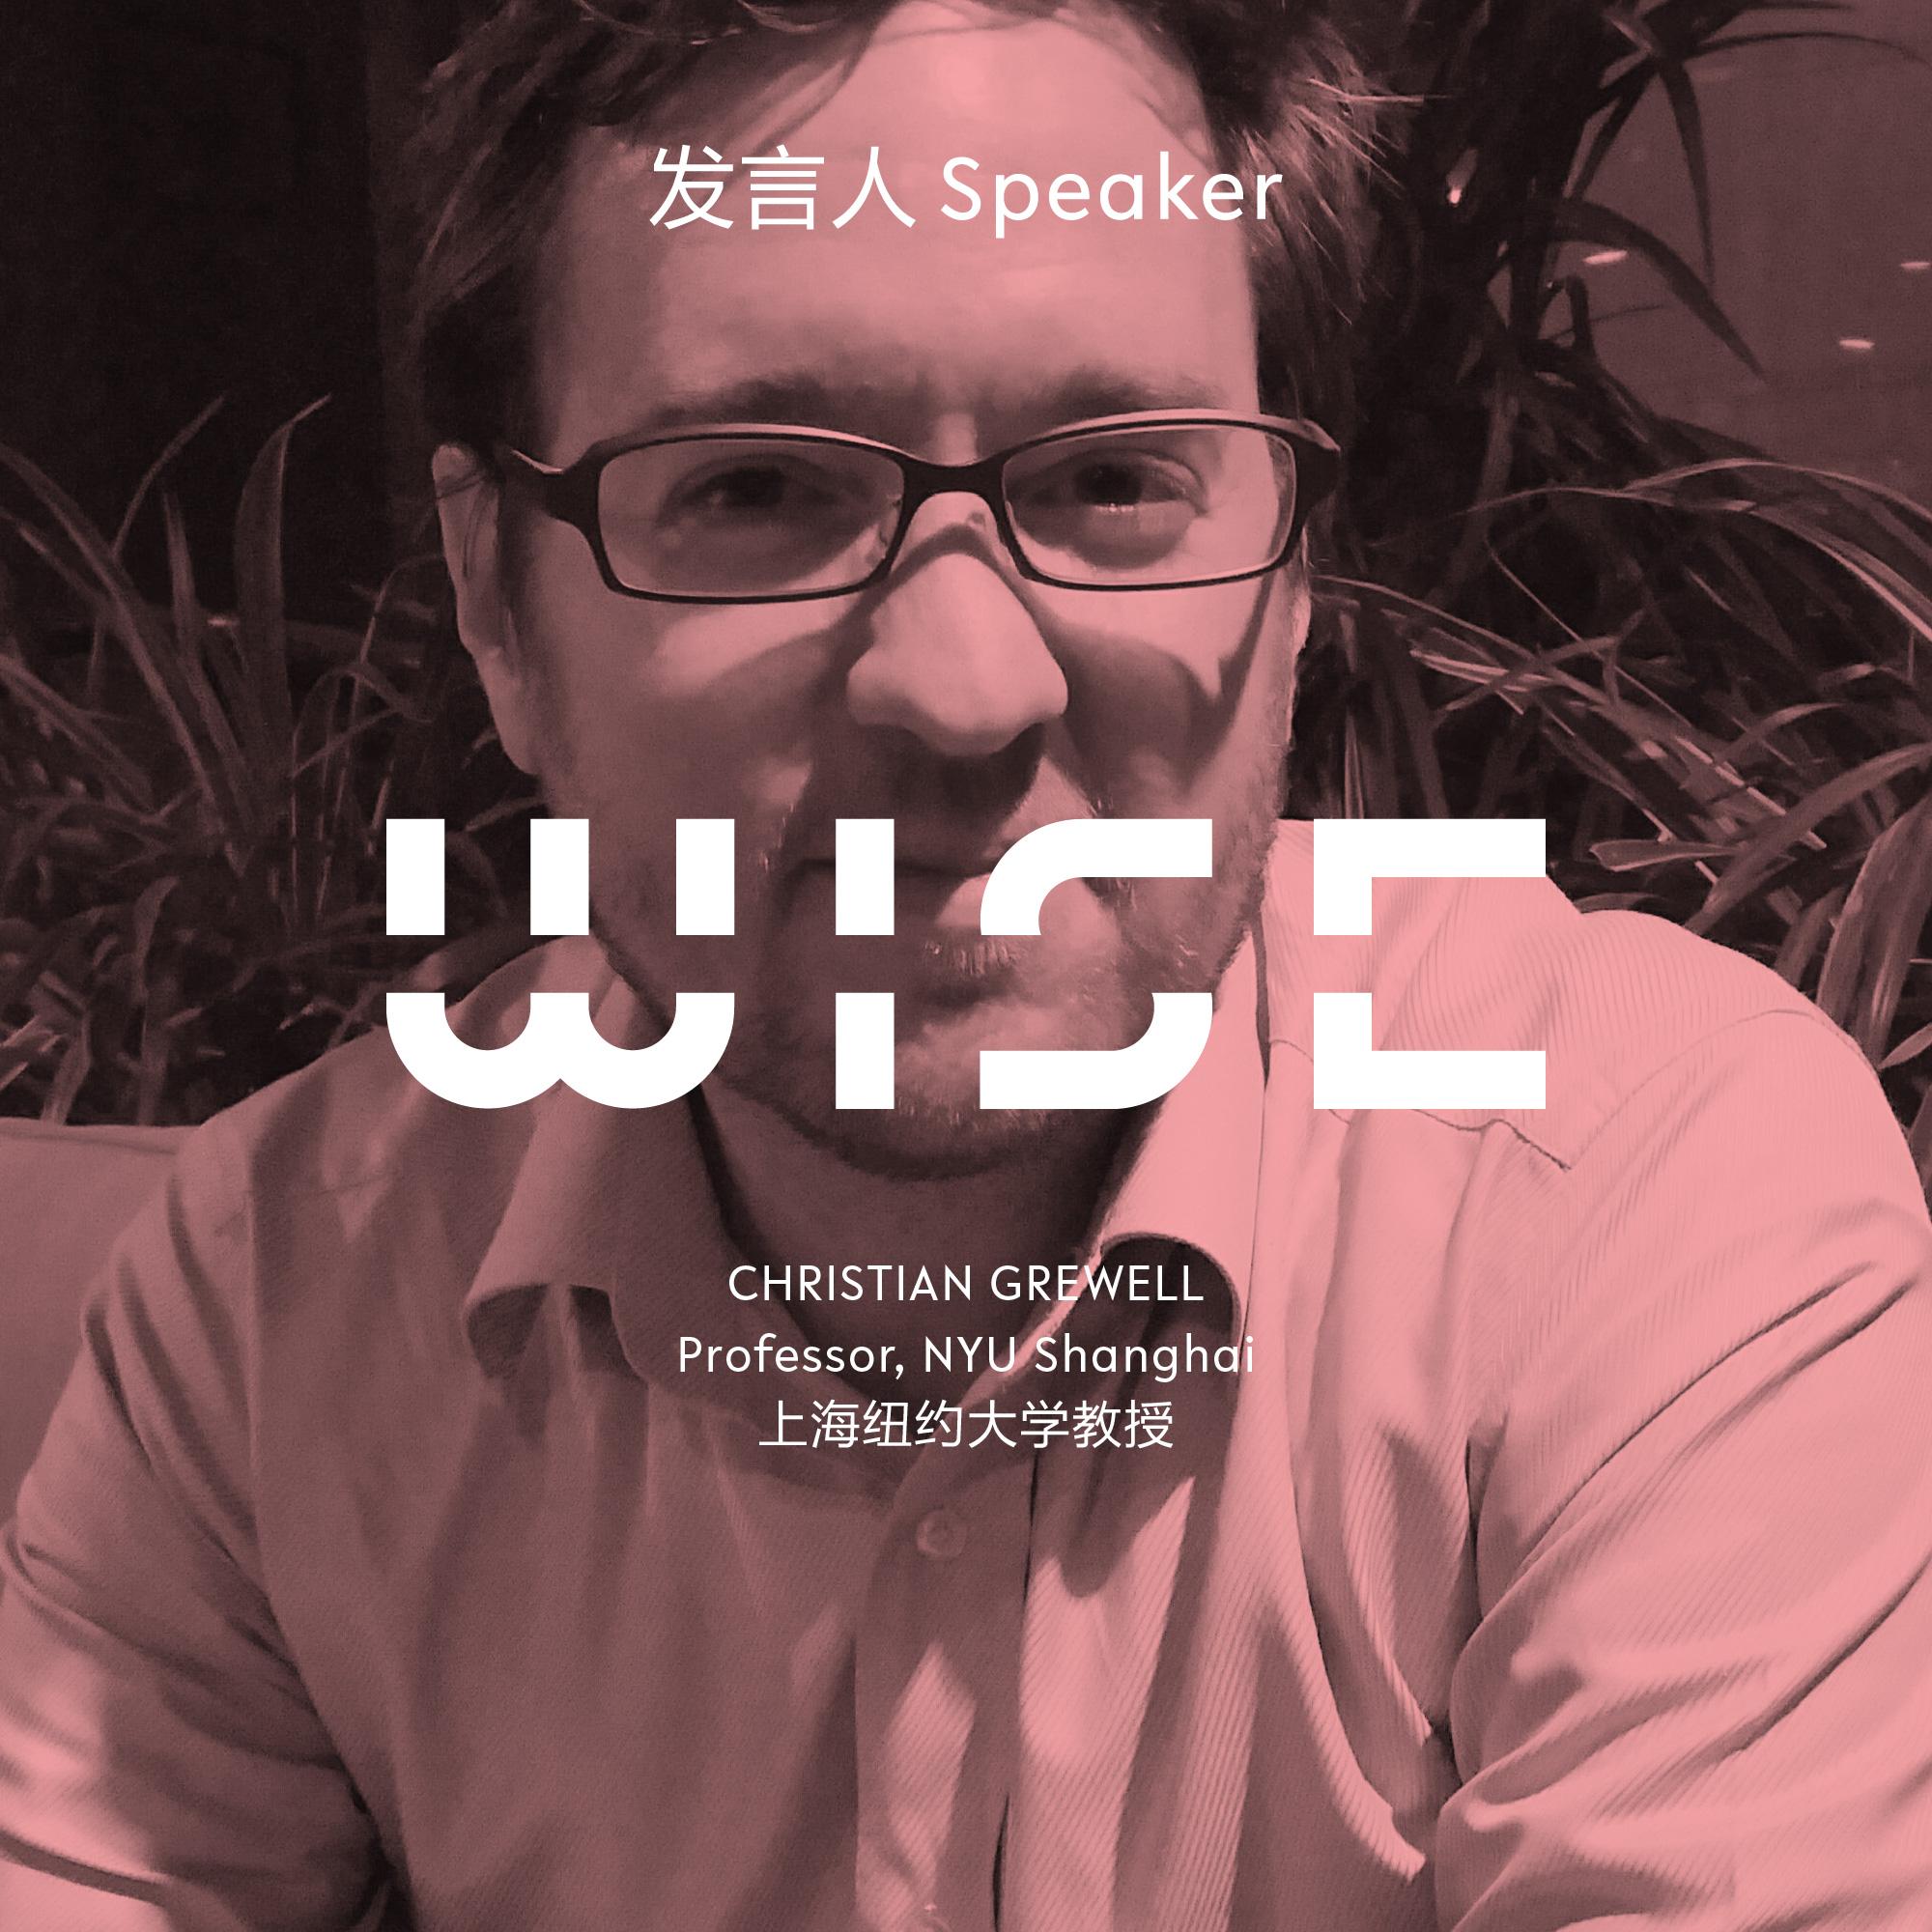 Christian Grewell(上海纽约大学教授)